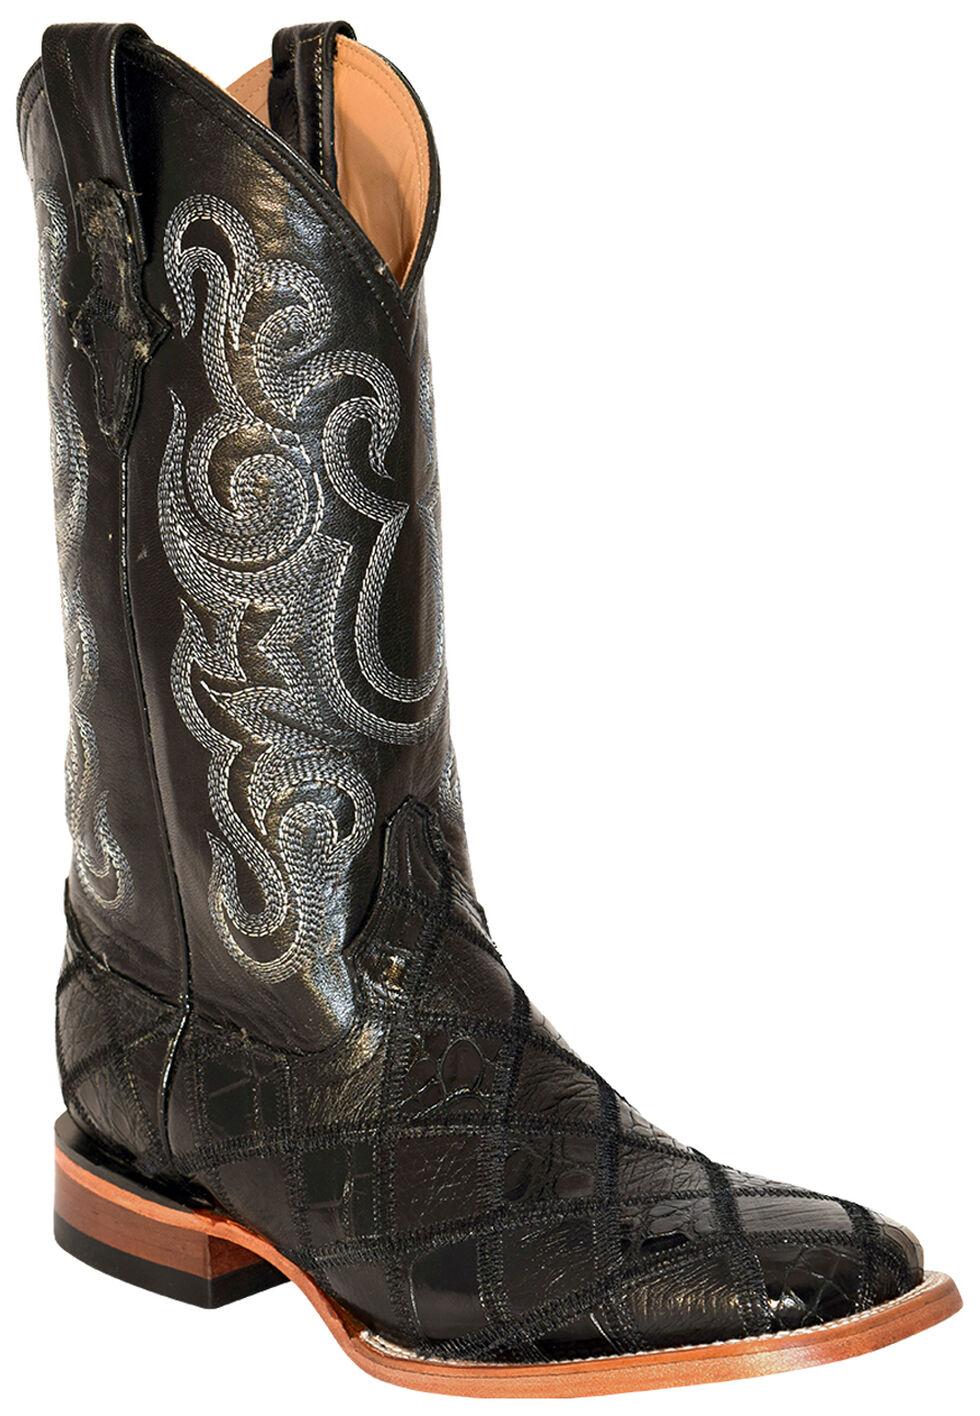 Ferrini Men's Gator Ostrich Patchwork Cowboy Boots - Square Toe, Black, hi-res